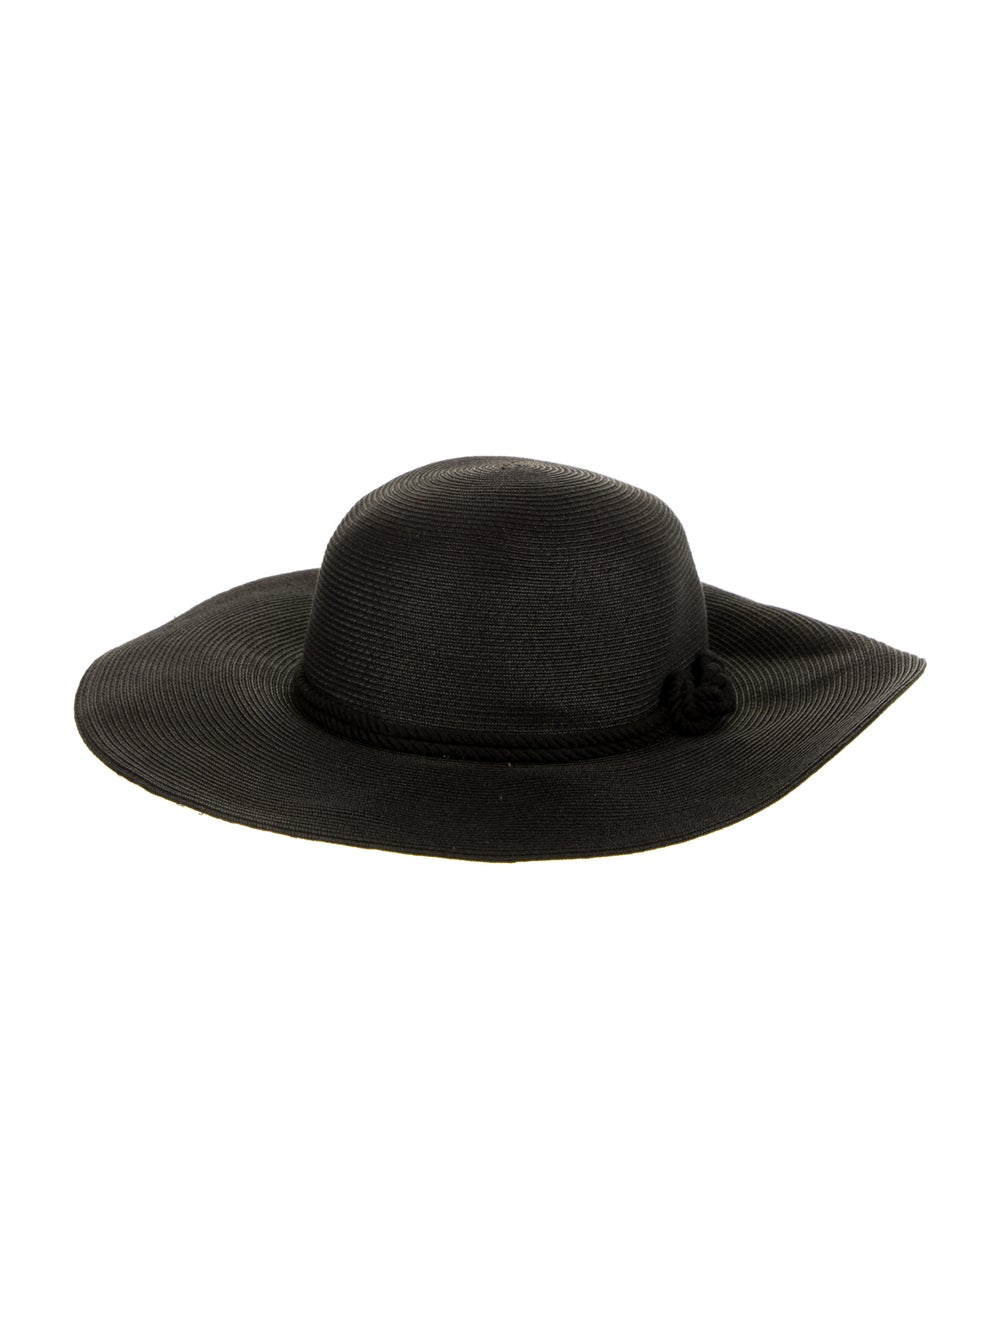 Eugenia Kim Wide Brim Straw Hat Black - image 2